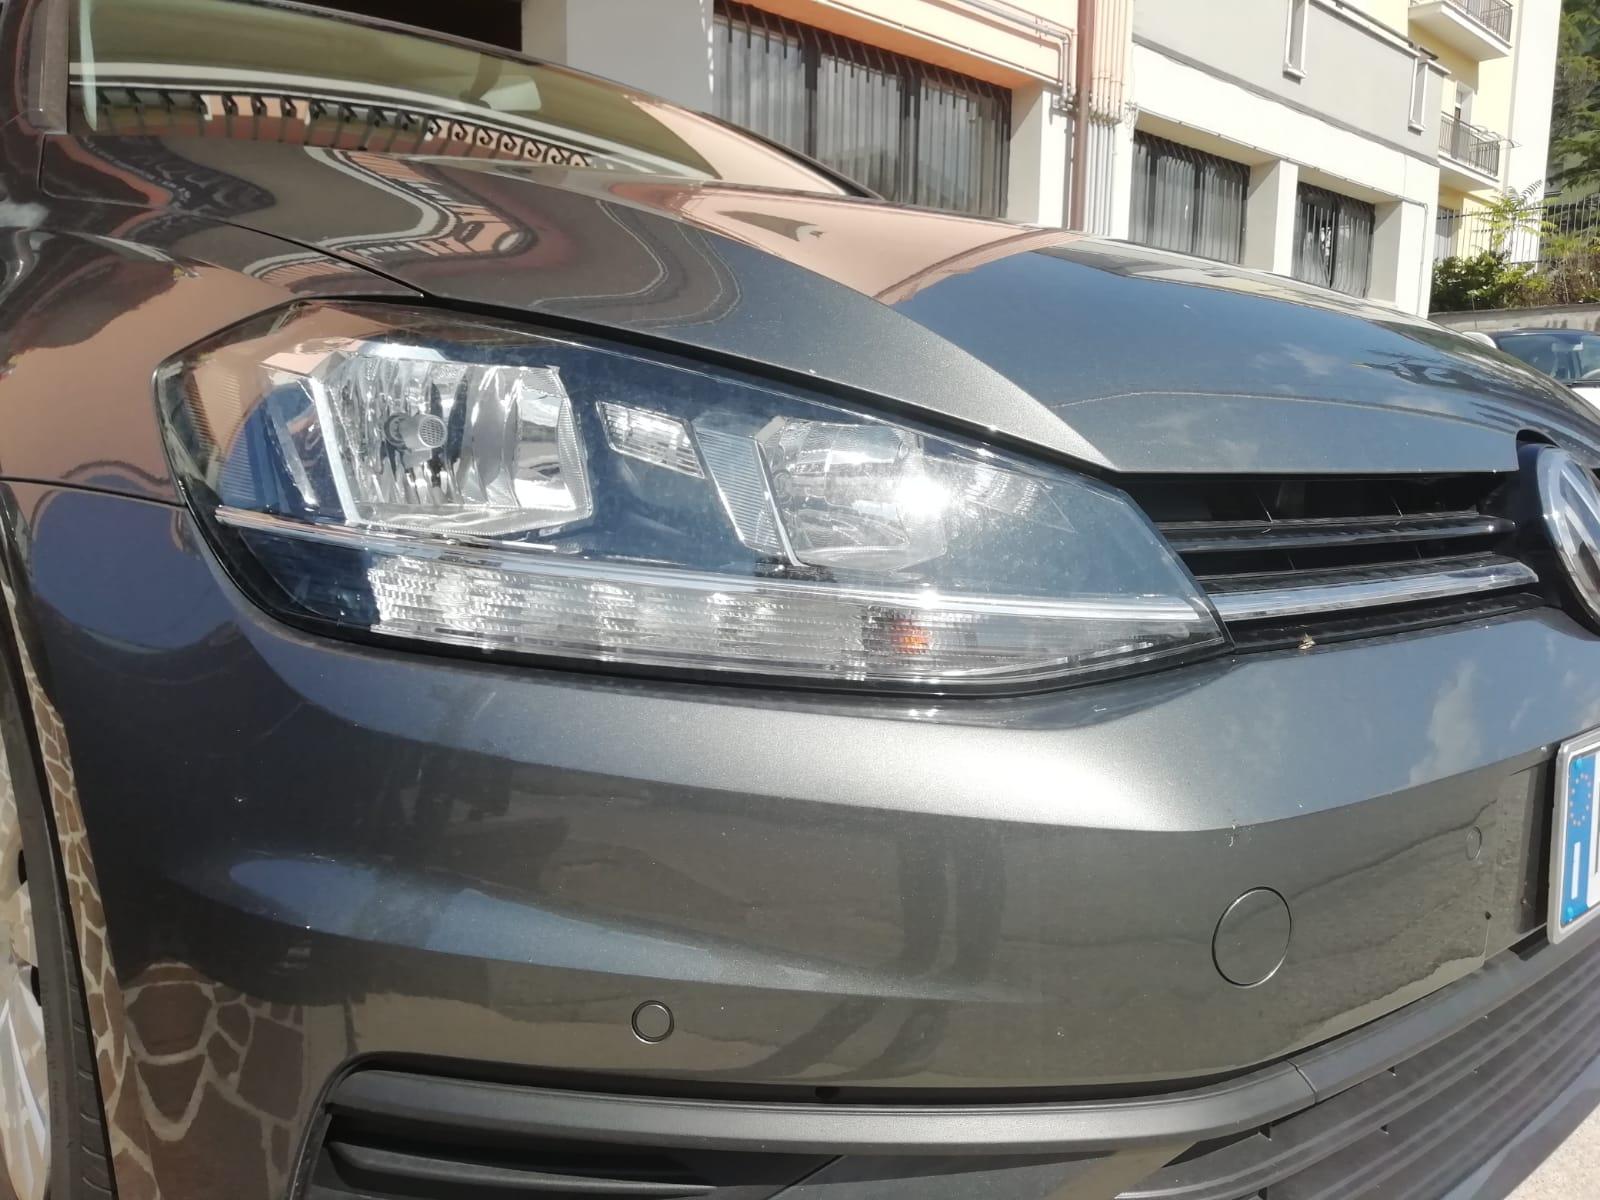 Vokswagen Golf 7.5 1.6 TDI 90 cv (OK Neopatentati)